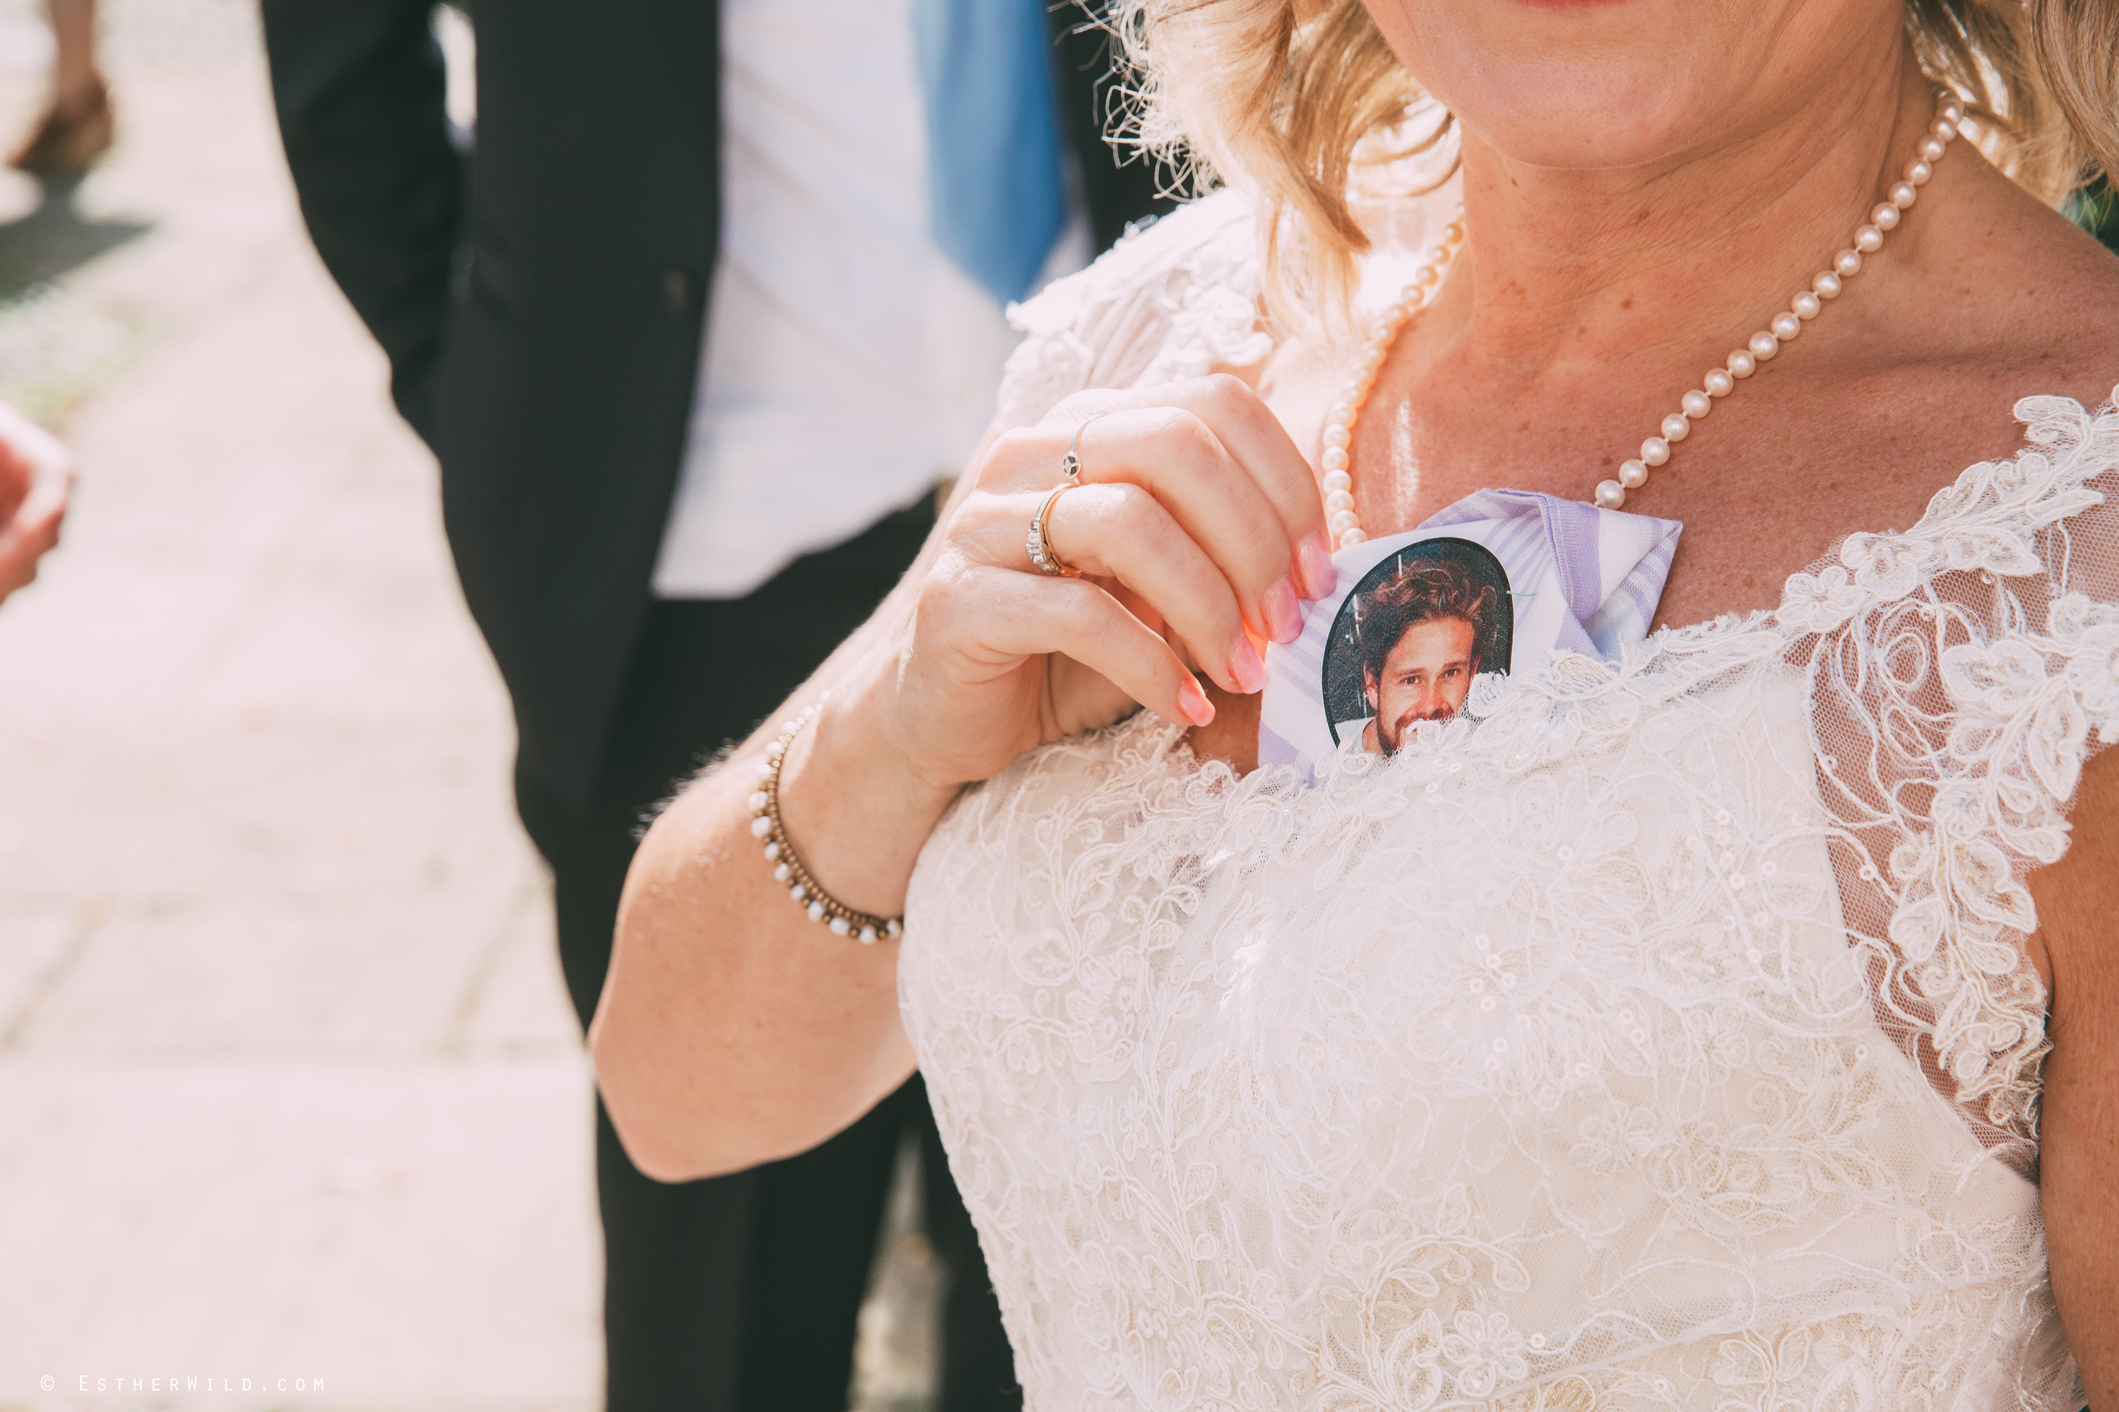 0817_Rathskellar_Kings_Lynn_East_Lexham_Church_Wedding_Photographer_Esther_Wild_IMG_1439.jpg